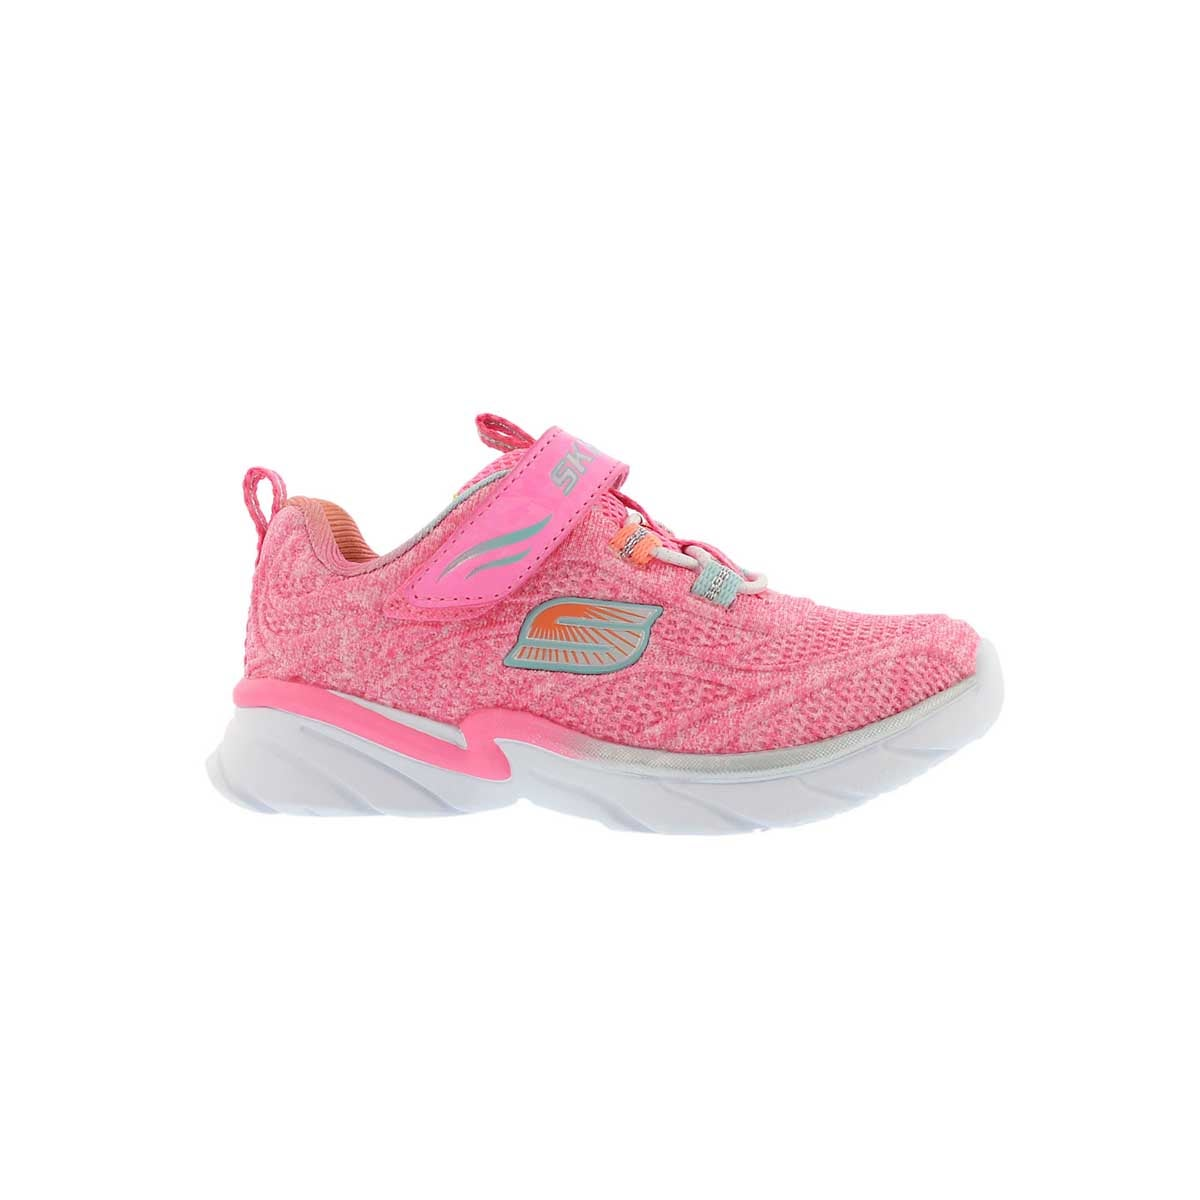 Inf-g Swirly Girl pink/silver sneaker